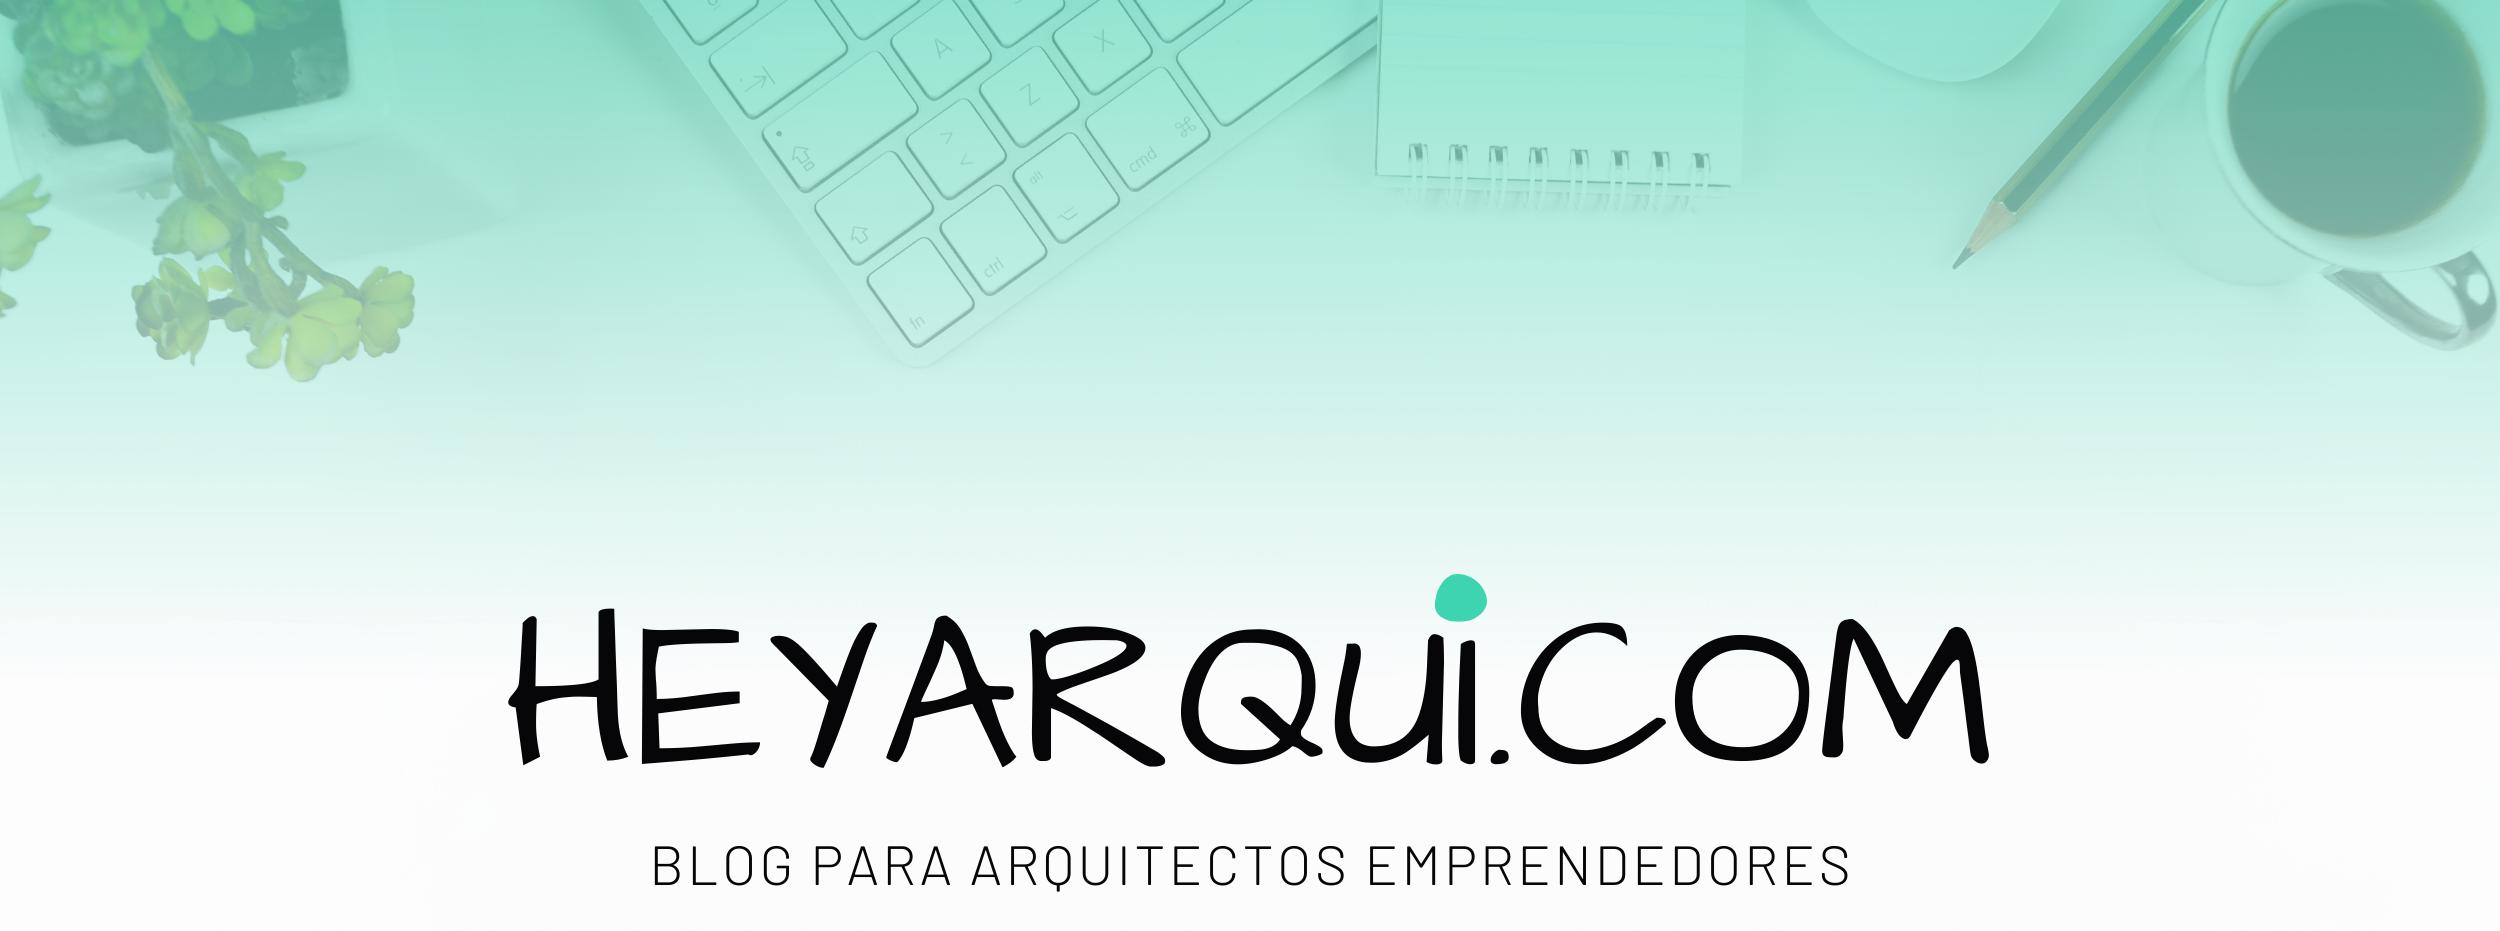 HEYARQUI.COM